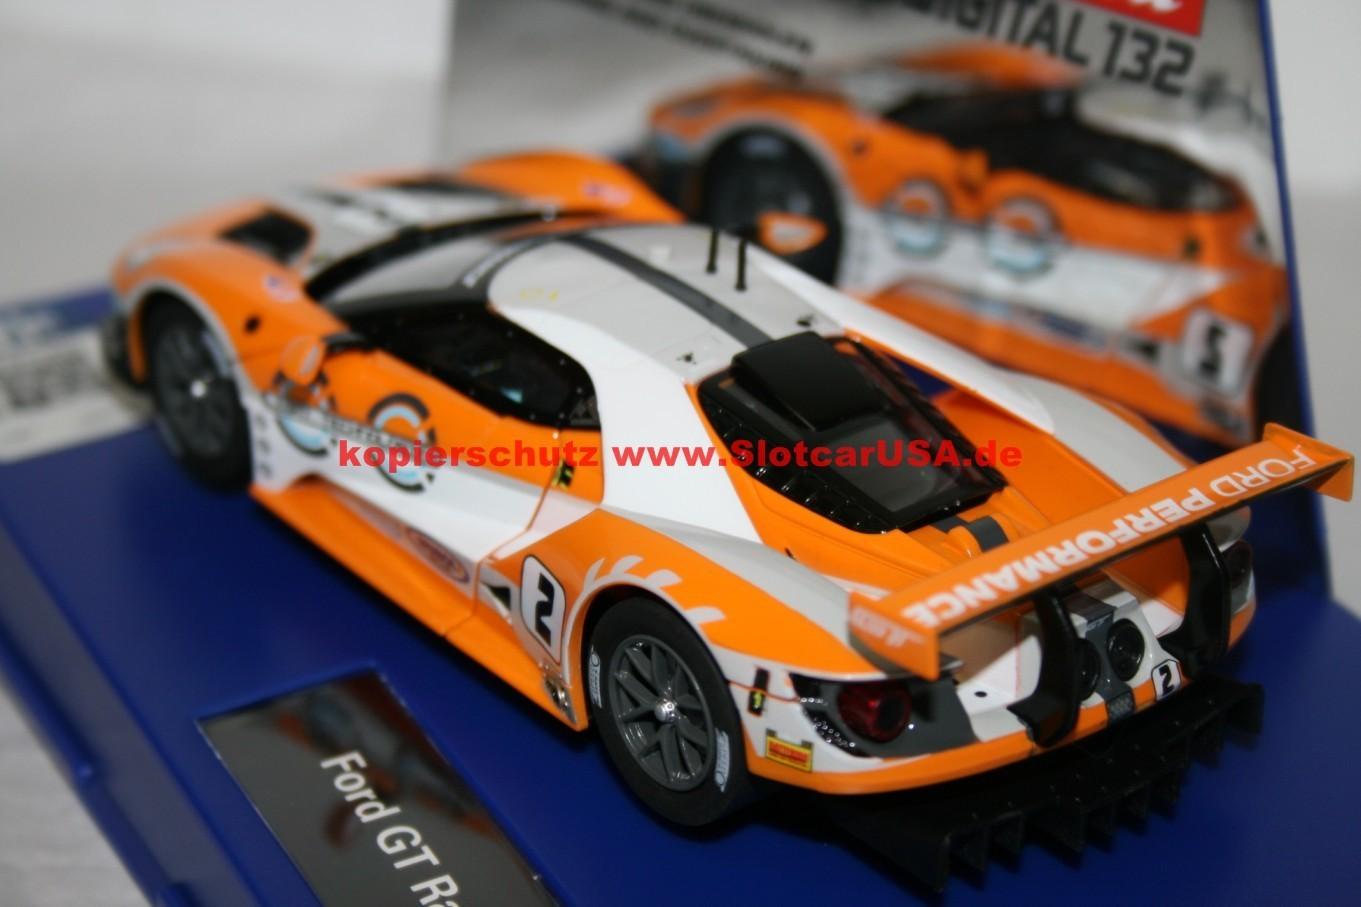 carrera digital 132 30786 ford gt race car nr 02 slotcarusa. Black Bedroom Furniture Sets. Home Design Ideas